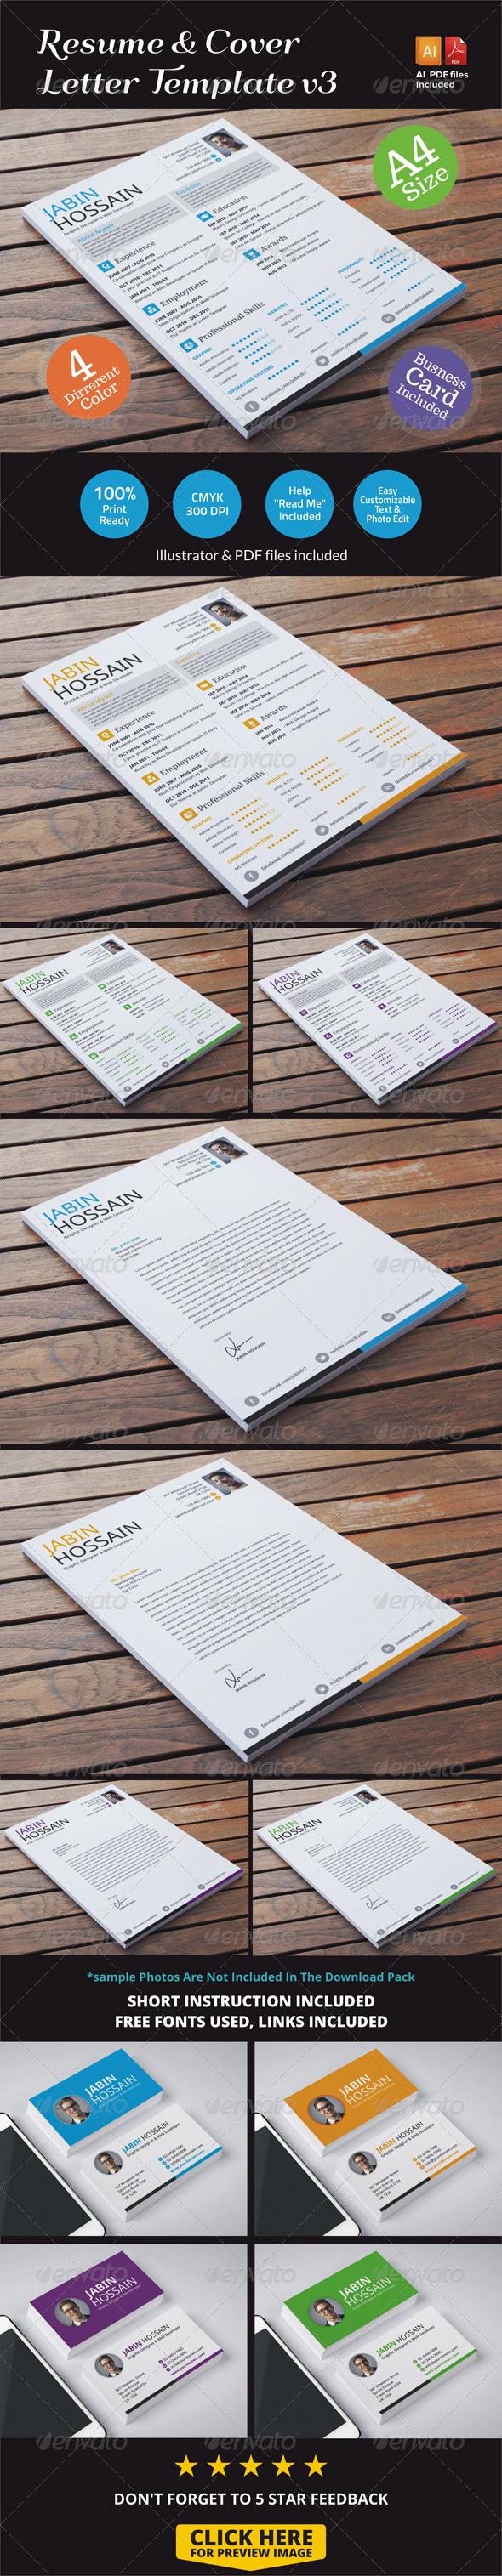 GraphicRiver Resume & Cover Letter Template v3 6862747